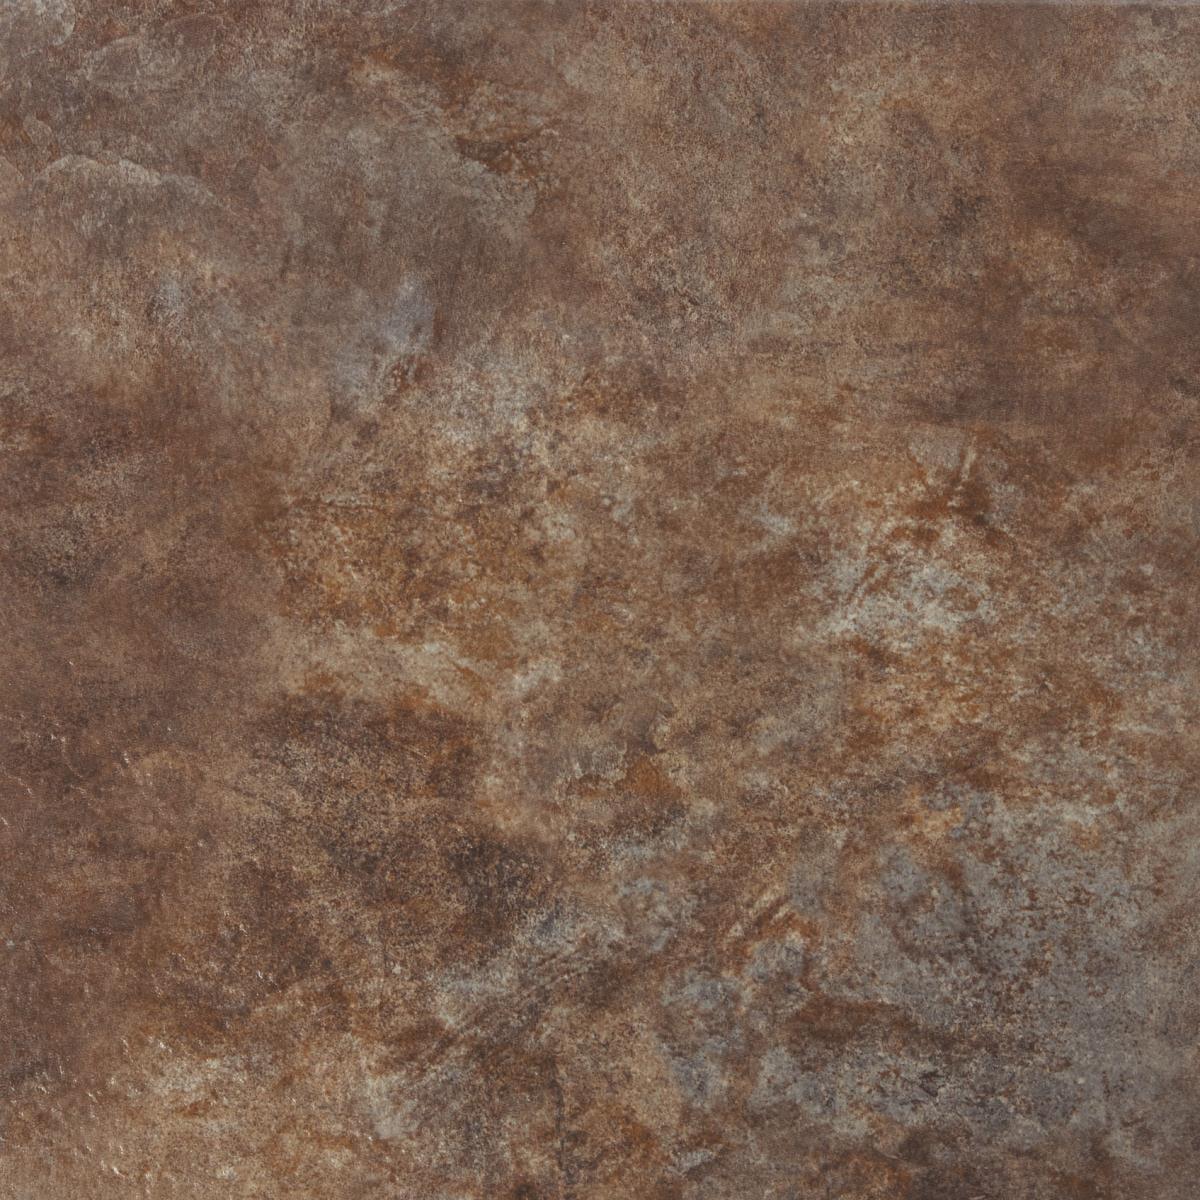 mohawk ovations brown 14 in square duraceramic floor tile c8005 te 49